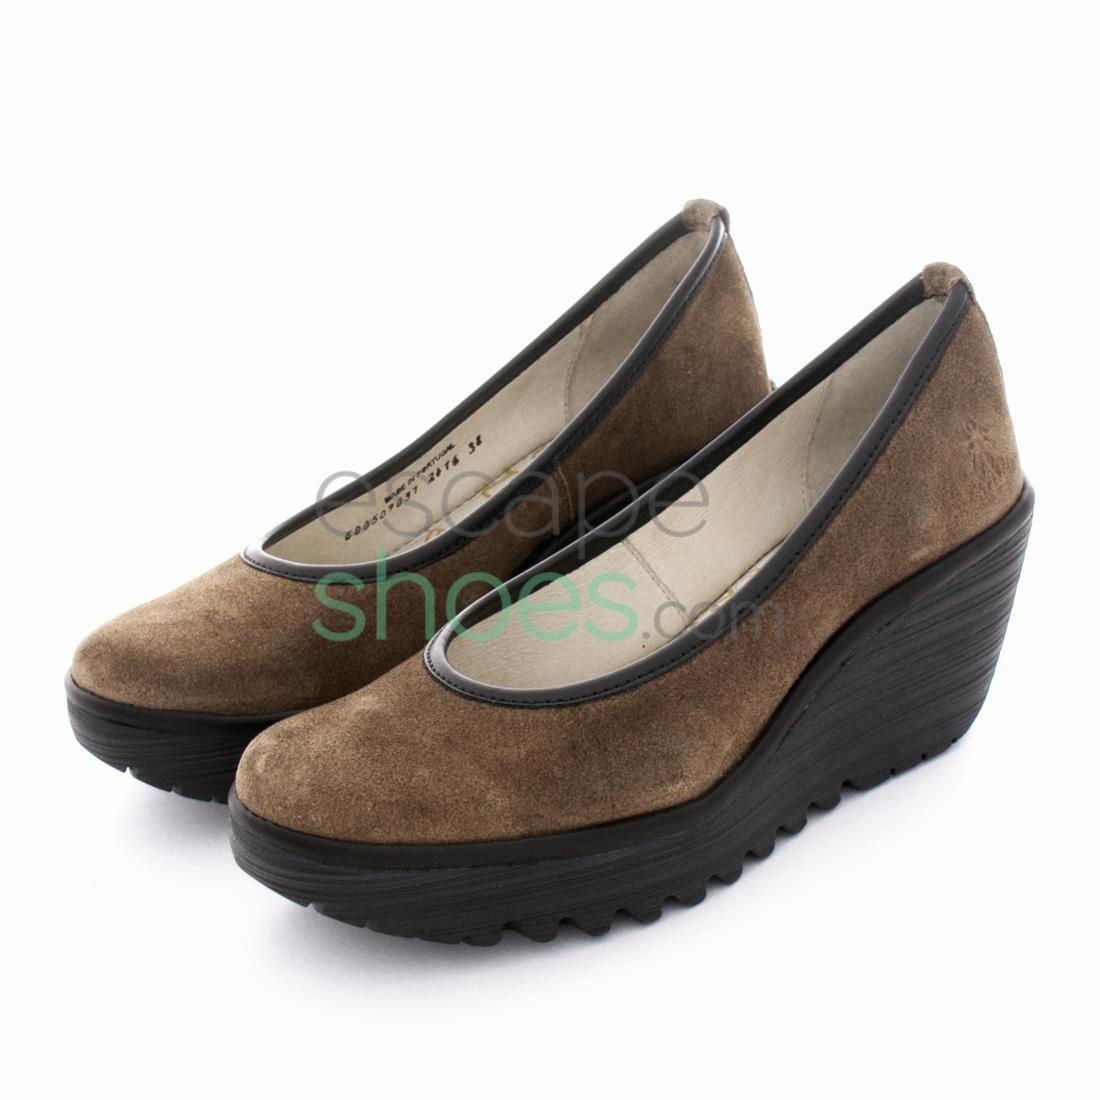 f585074dedb Zapatos FLY LONDON Yellow Yalu Camel P500509031 - EscapeShoes